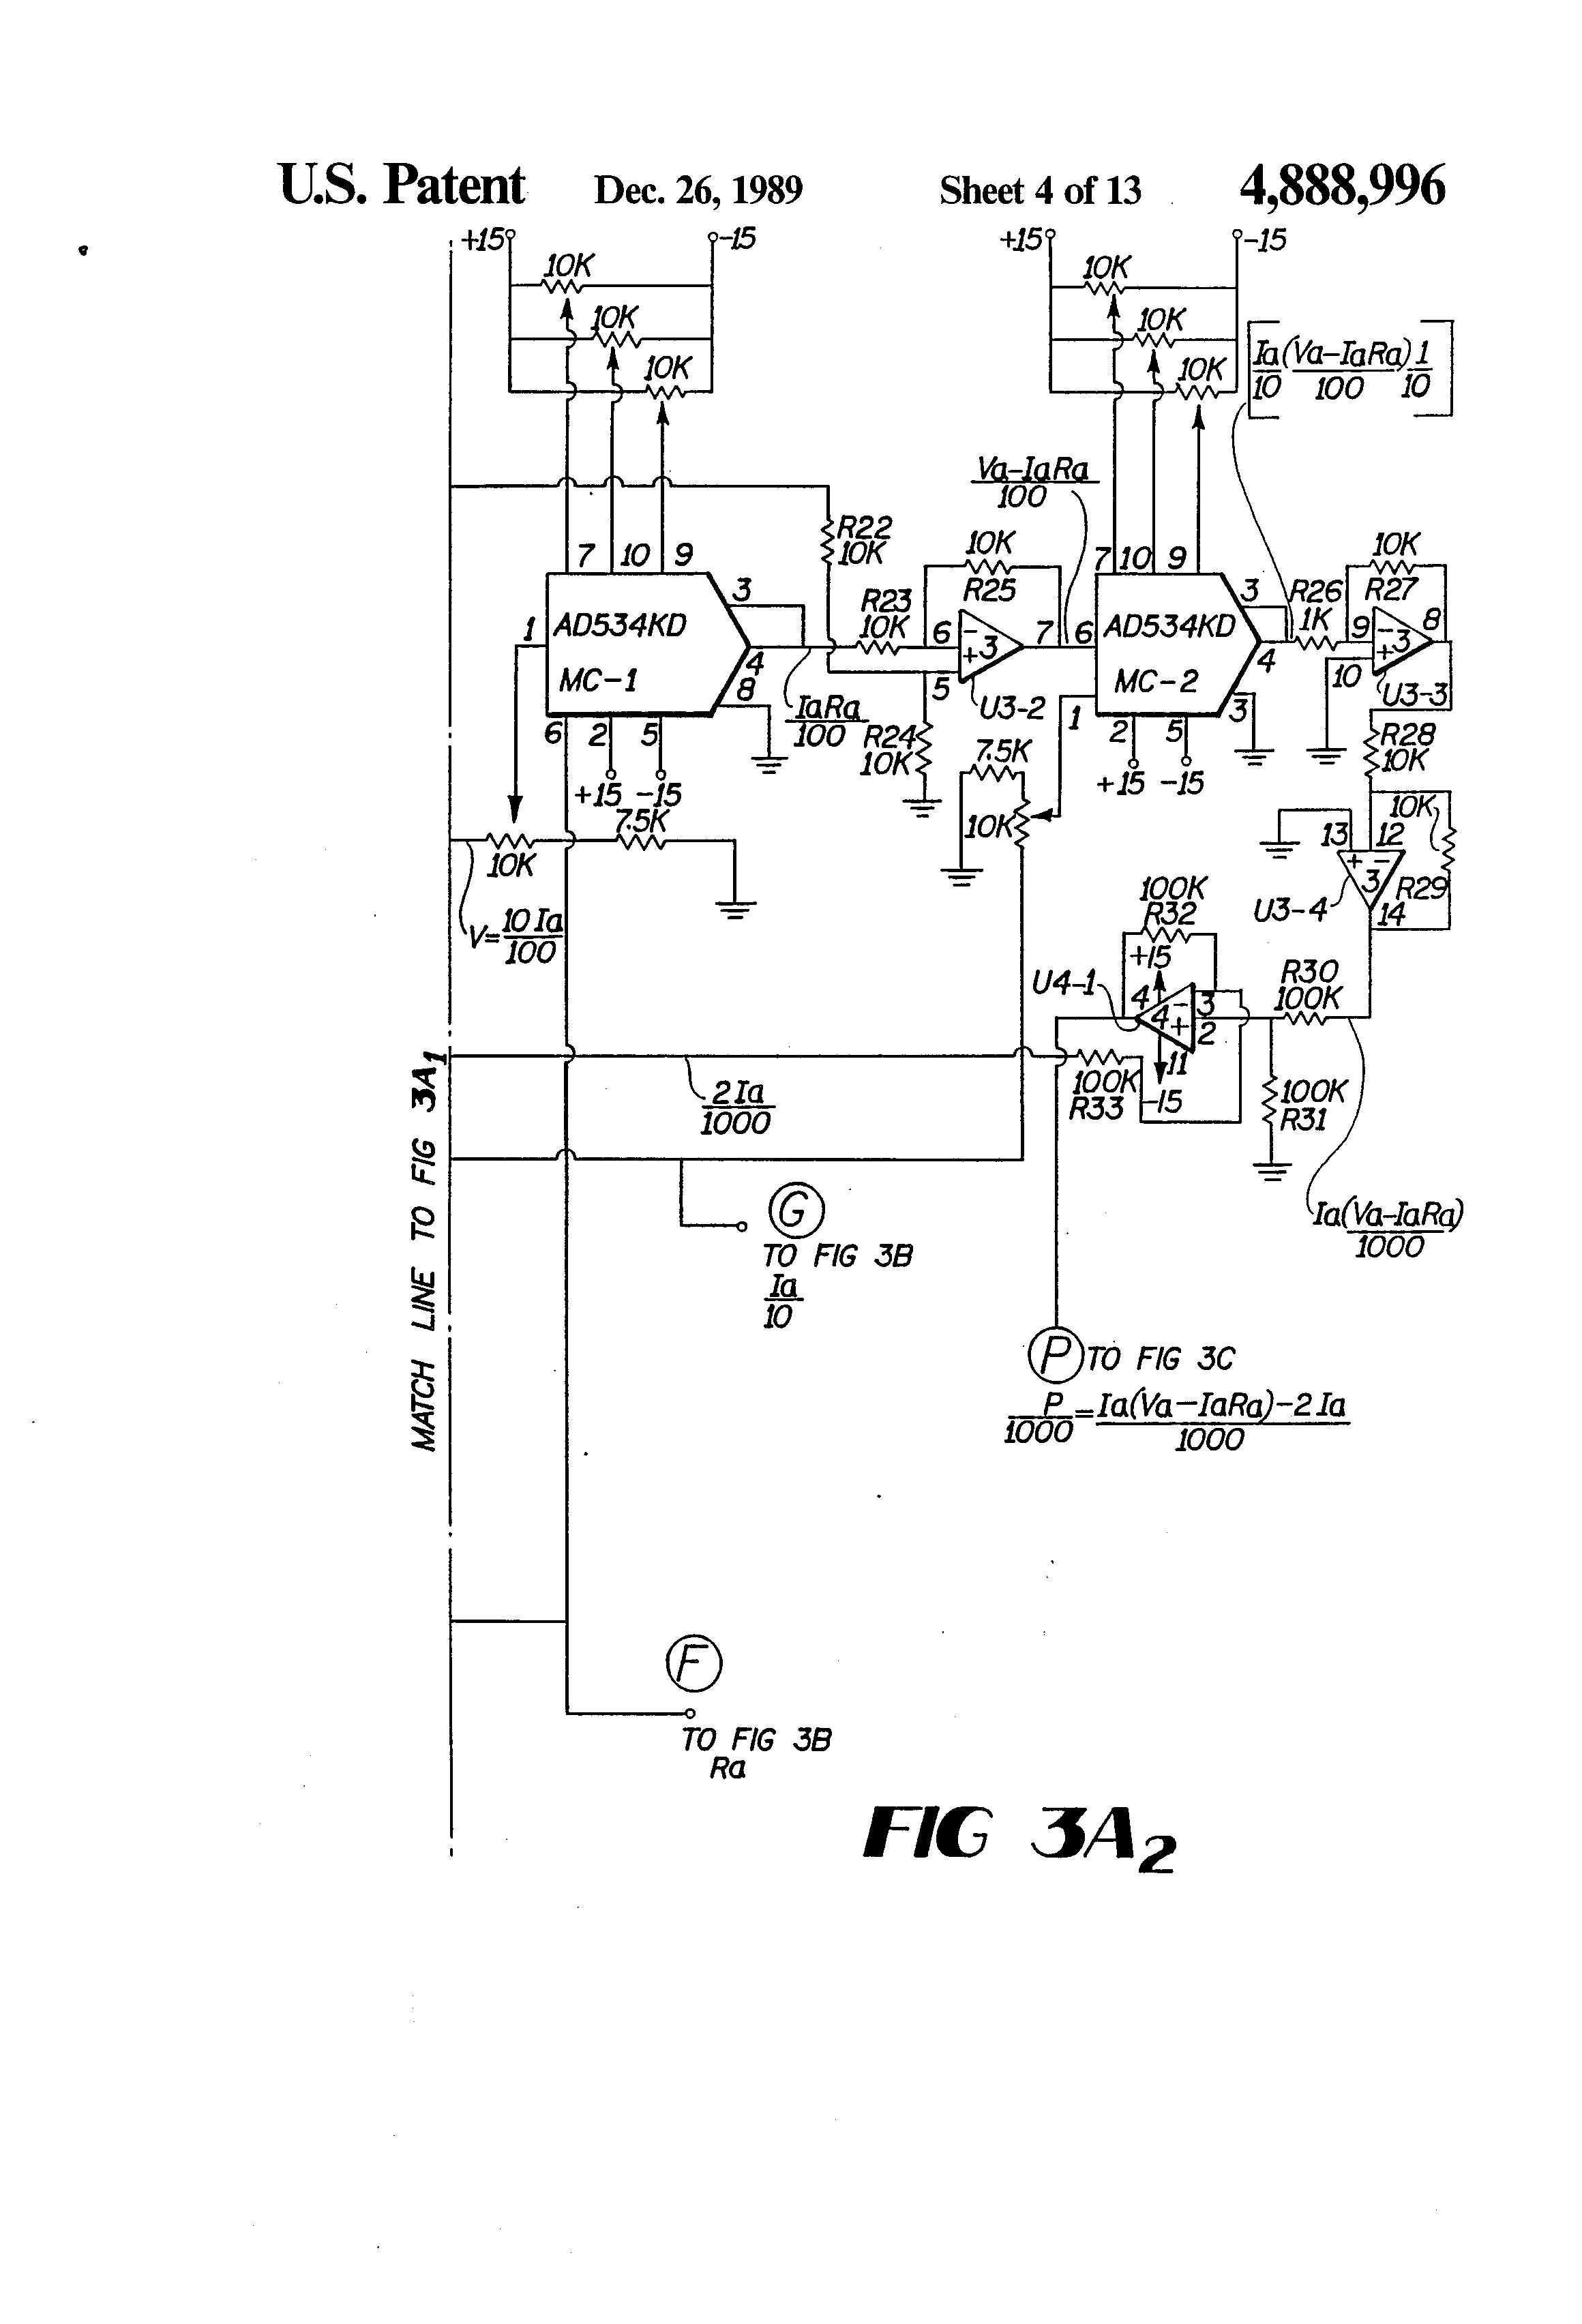 limitorque wiring diagram on limitorque smb 000 manual, limitorque smb  2 drawings, limitorque smb